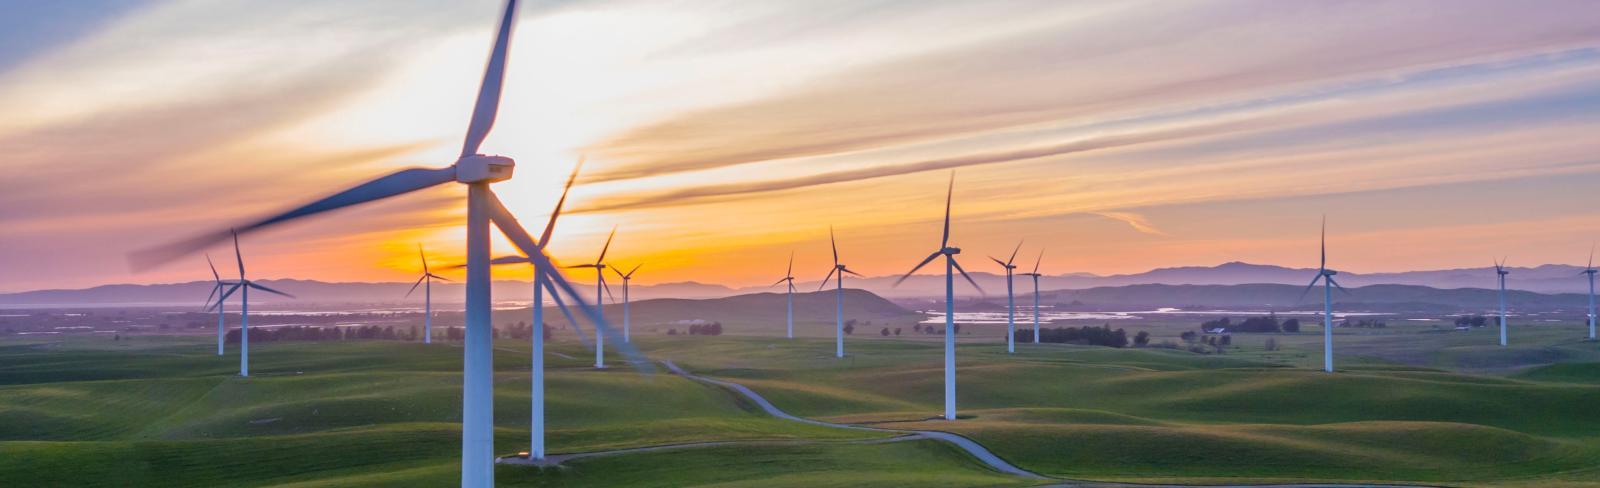 Windfarm Photo by RawFilm on Unsplash